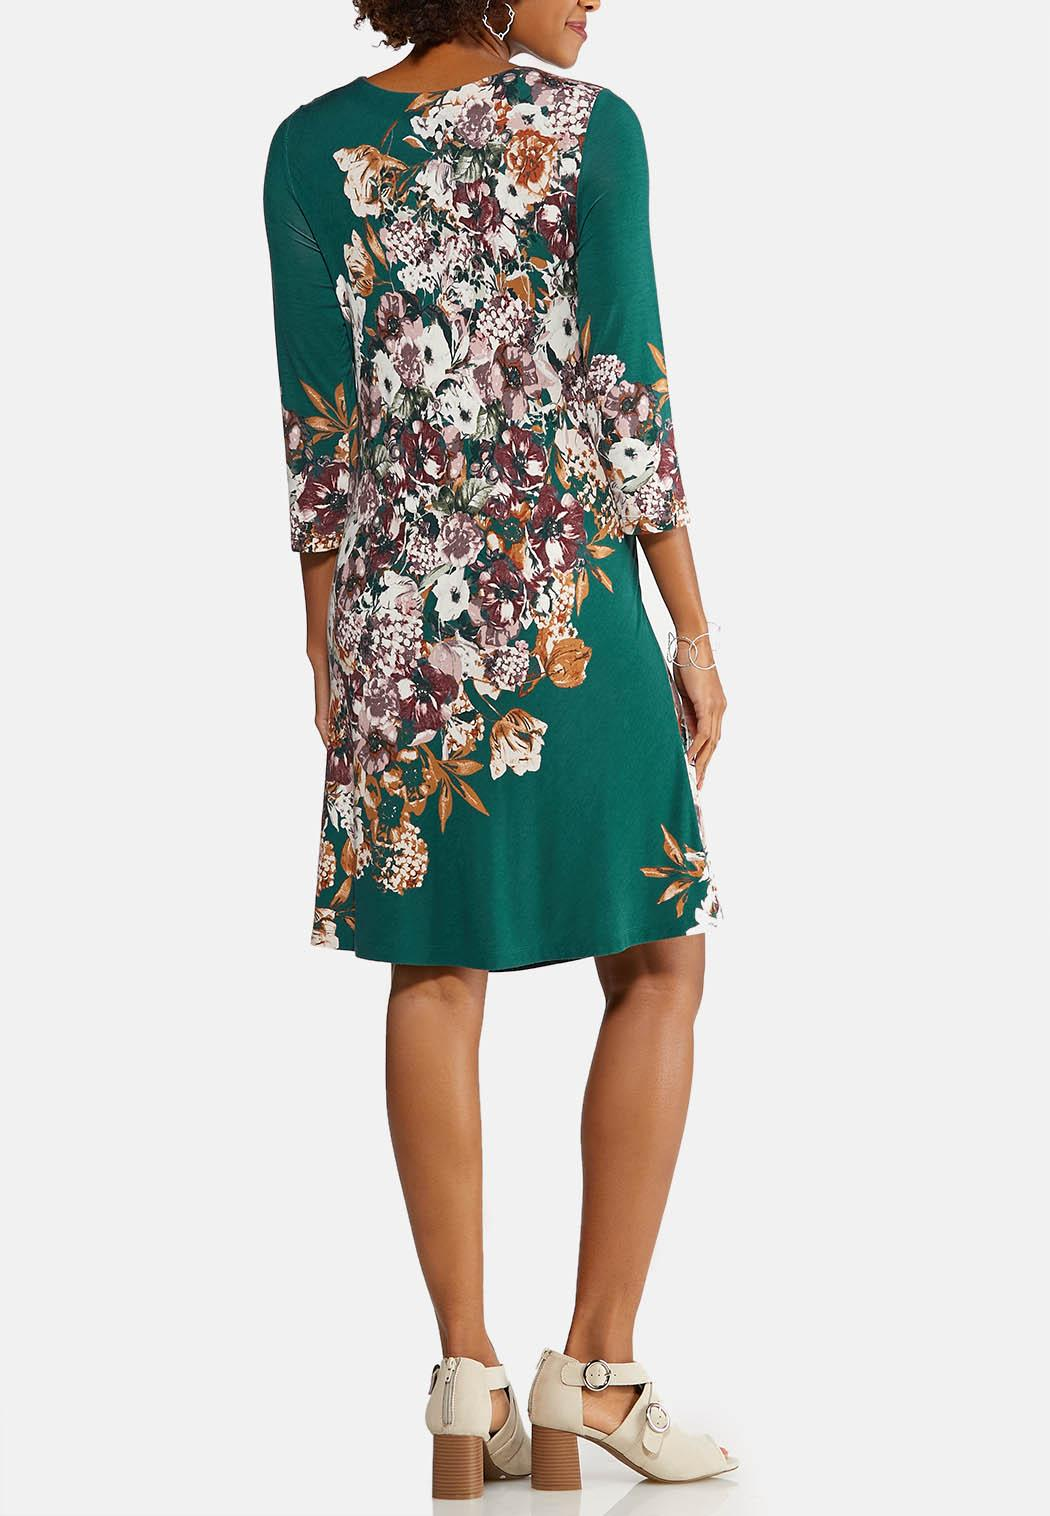 Plus Size Floral Swing Dress (Item #43947562)